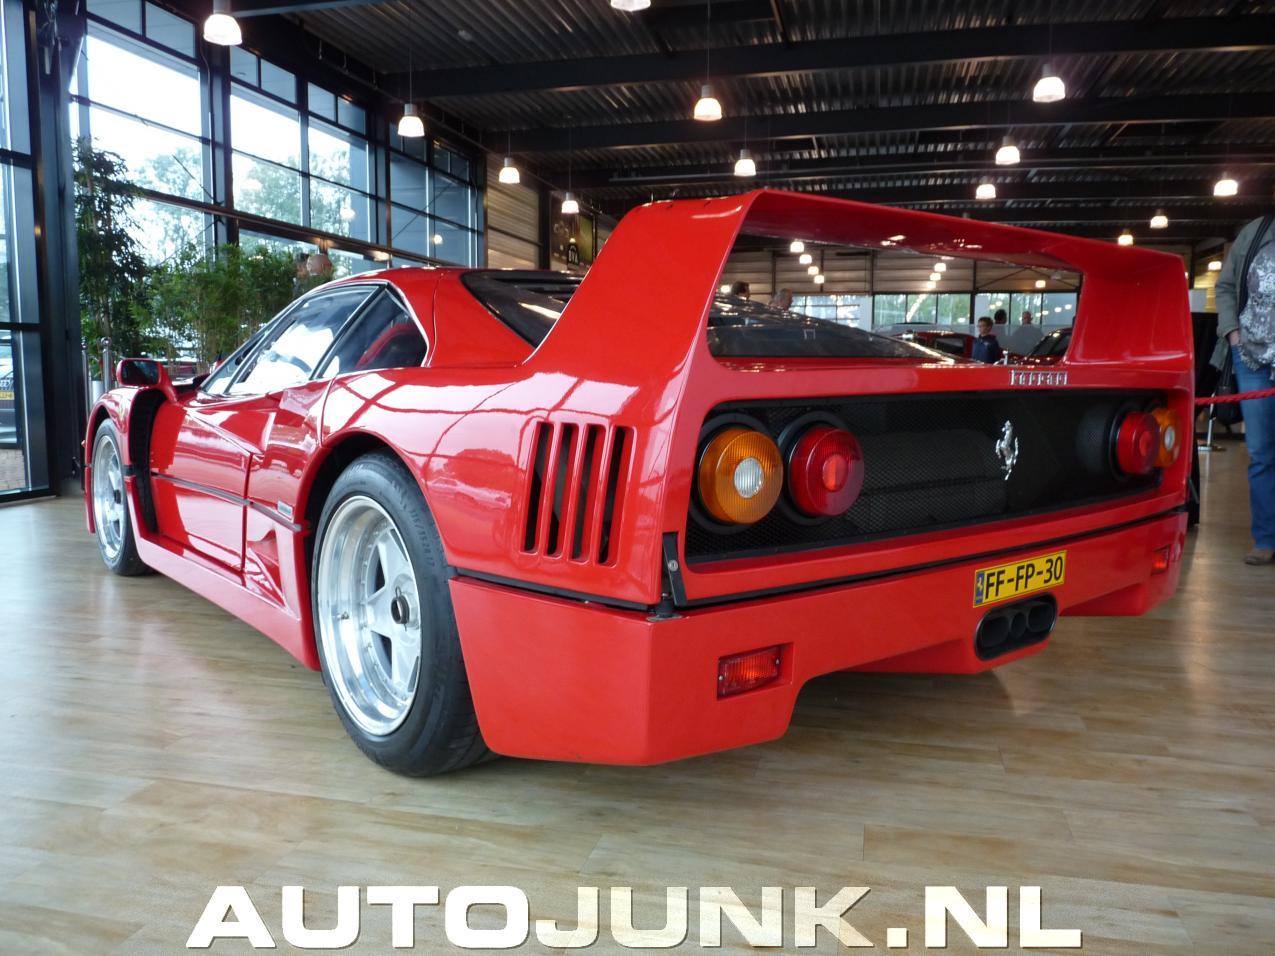 Bva Auctions Kijkdag Foto S 187 Autojunk Nl 83032